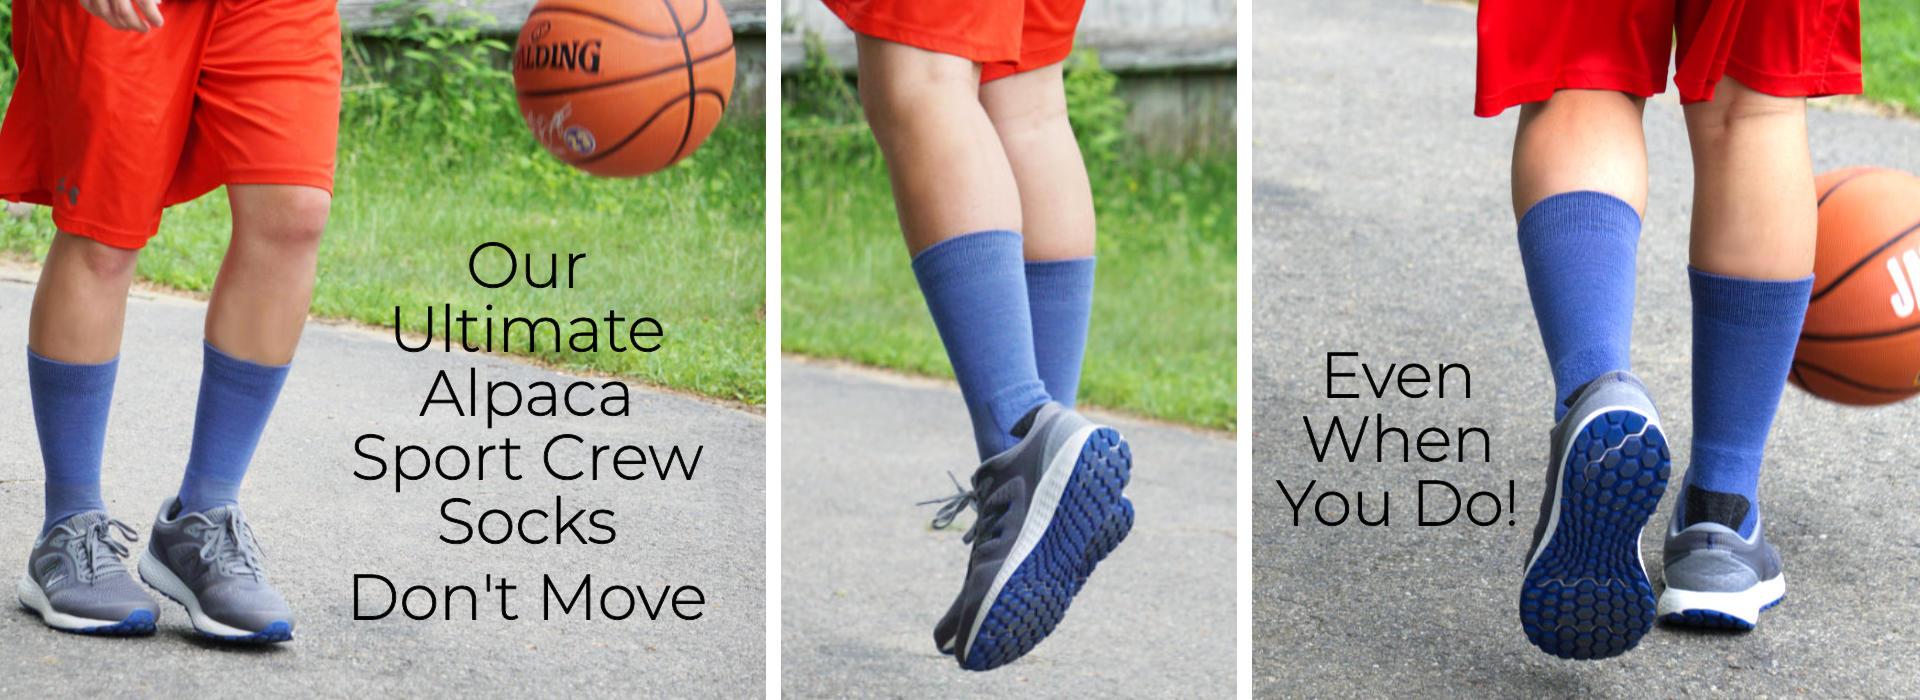 Ultimate Alpaca Sport Crew Socks